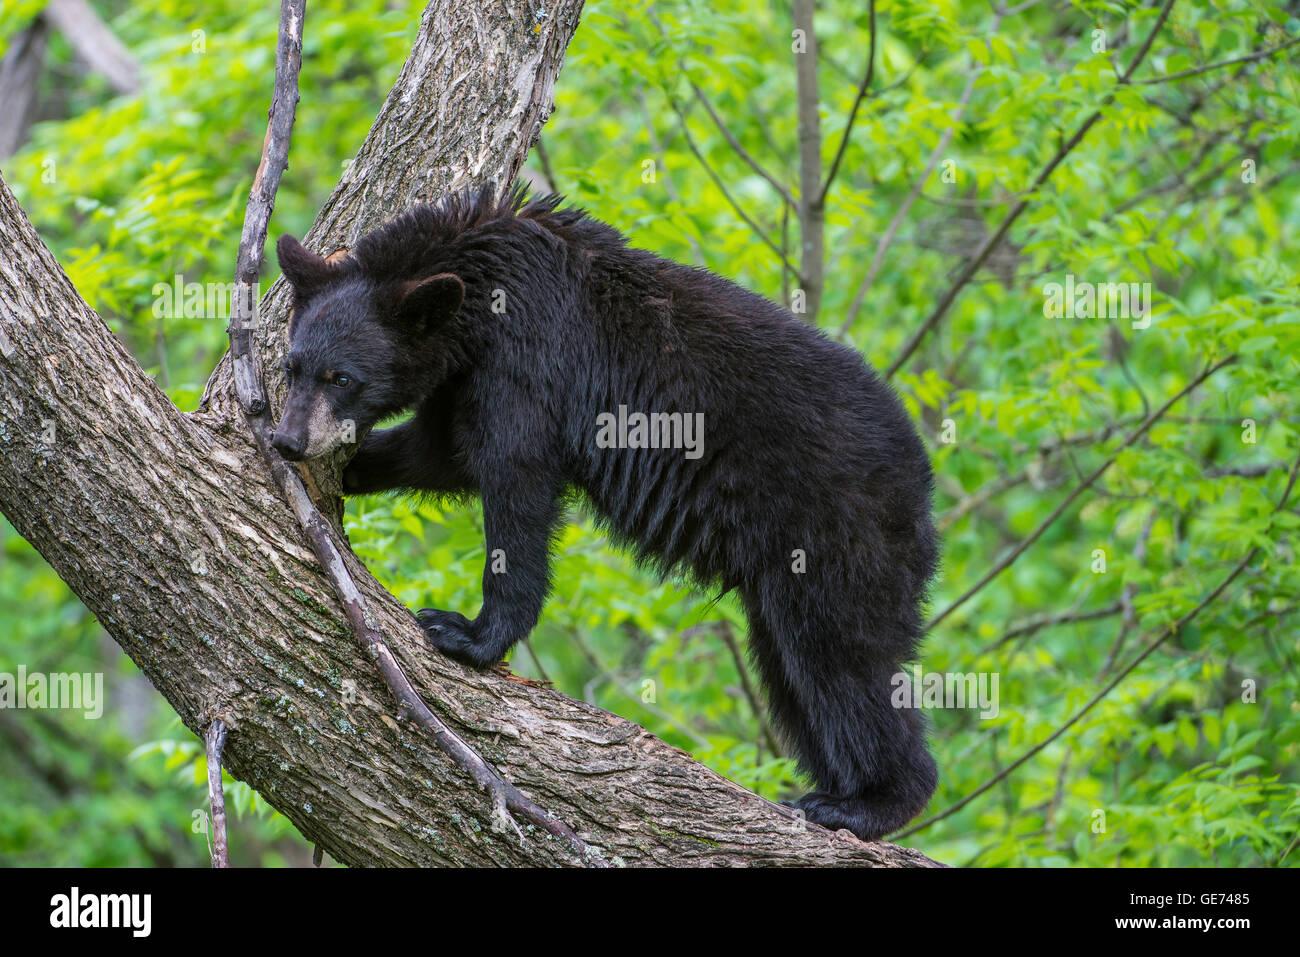 Black bear yearling Urus americanus, climbing tree, North America - Stock Image